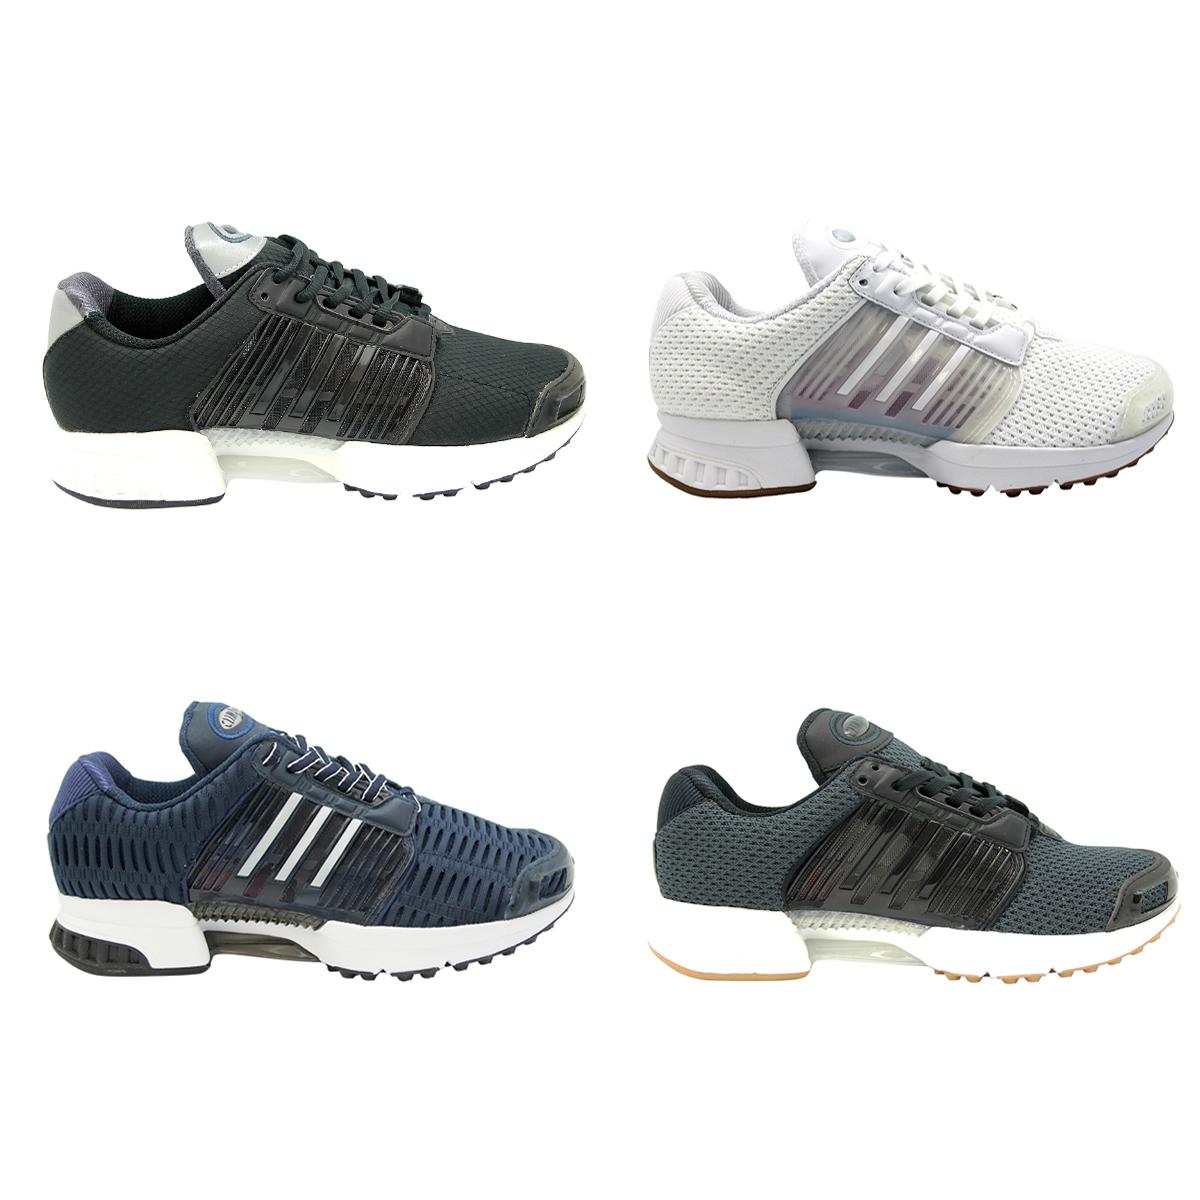 Adidas Originals caballeros Climacool 1 caballeros Originals sneakers zapatos nuevo b7c66f